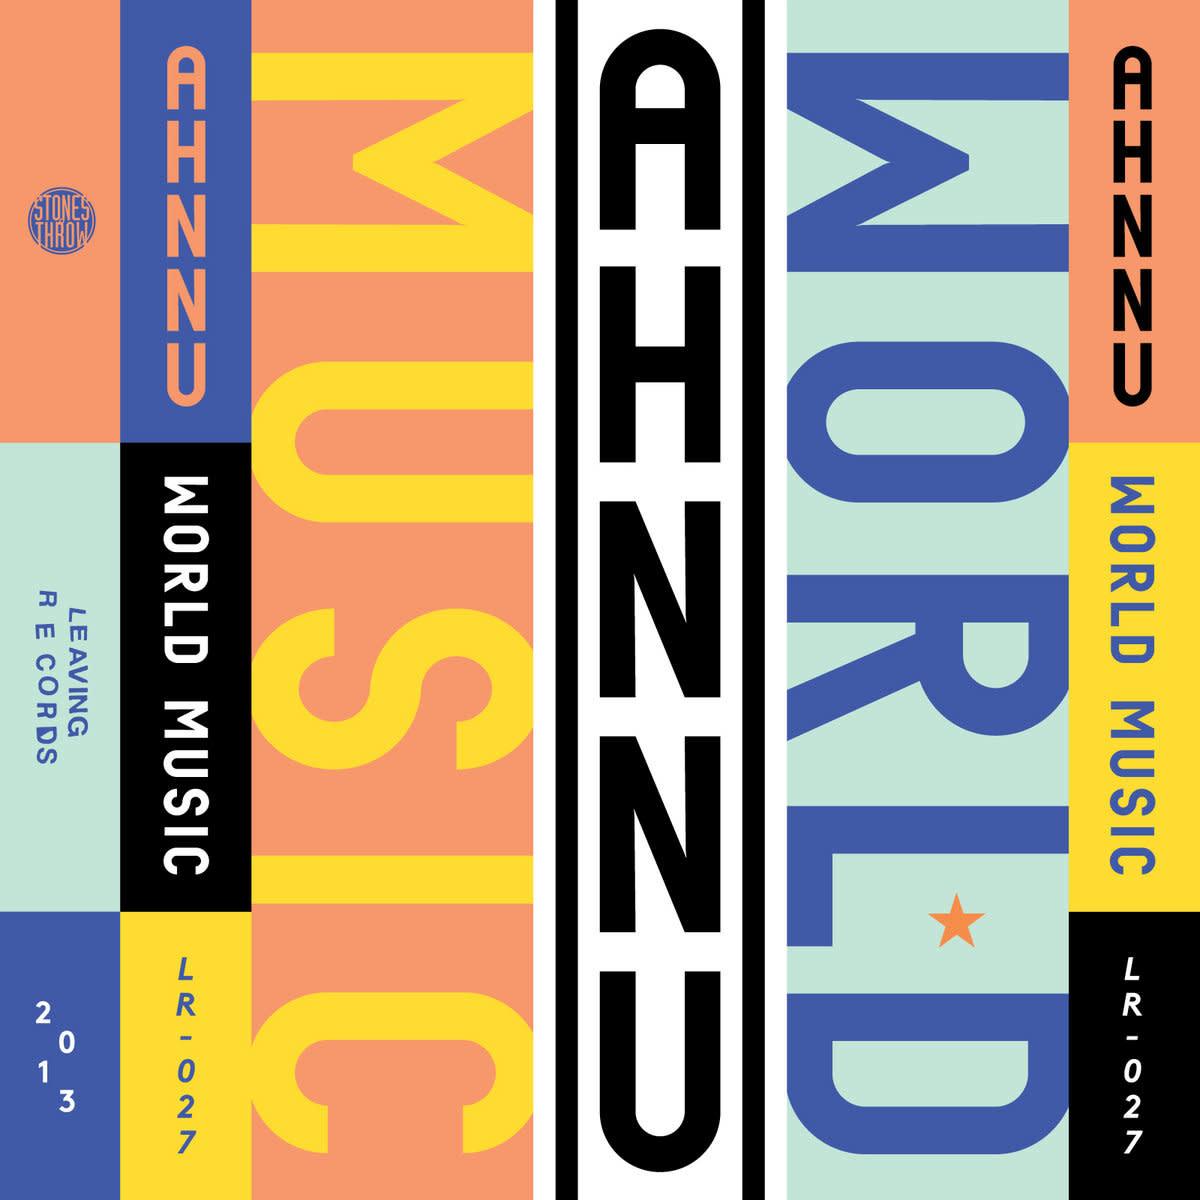 Ahnnu • World Music + Perception-1